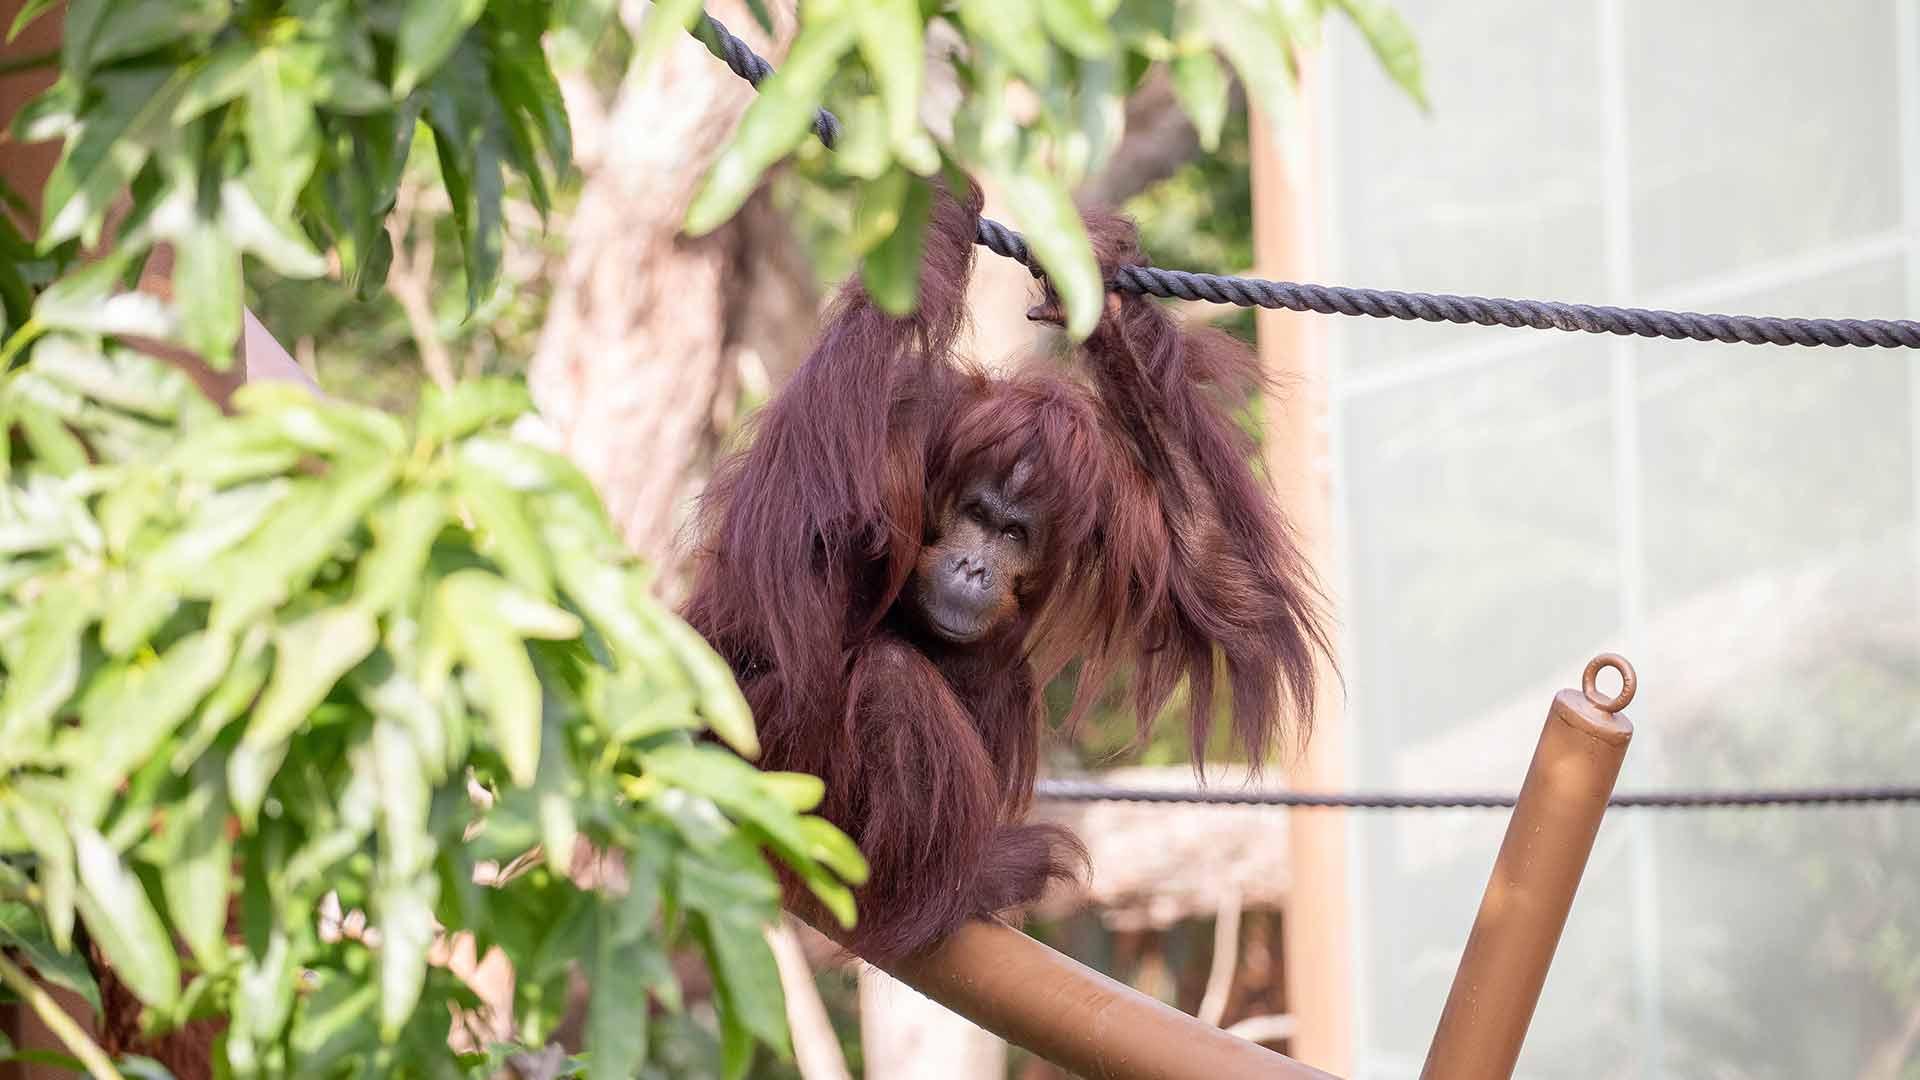 https://rfacdn.nz/zoo/assets/media/orangutan-move-gallery-10.jpg